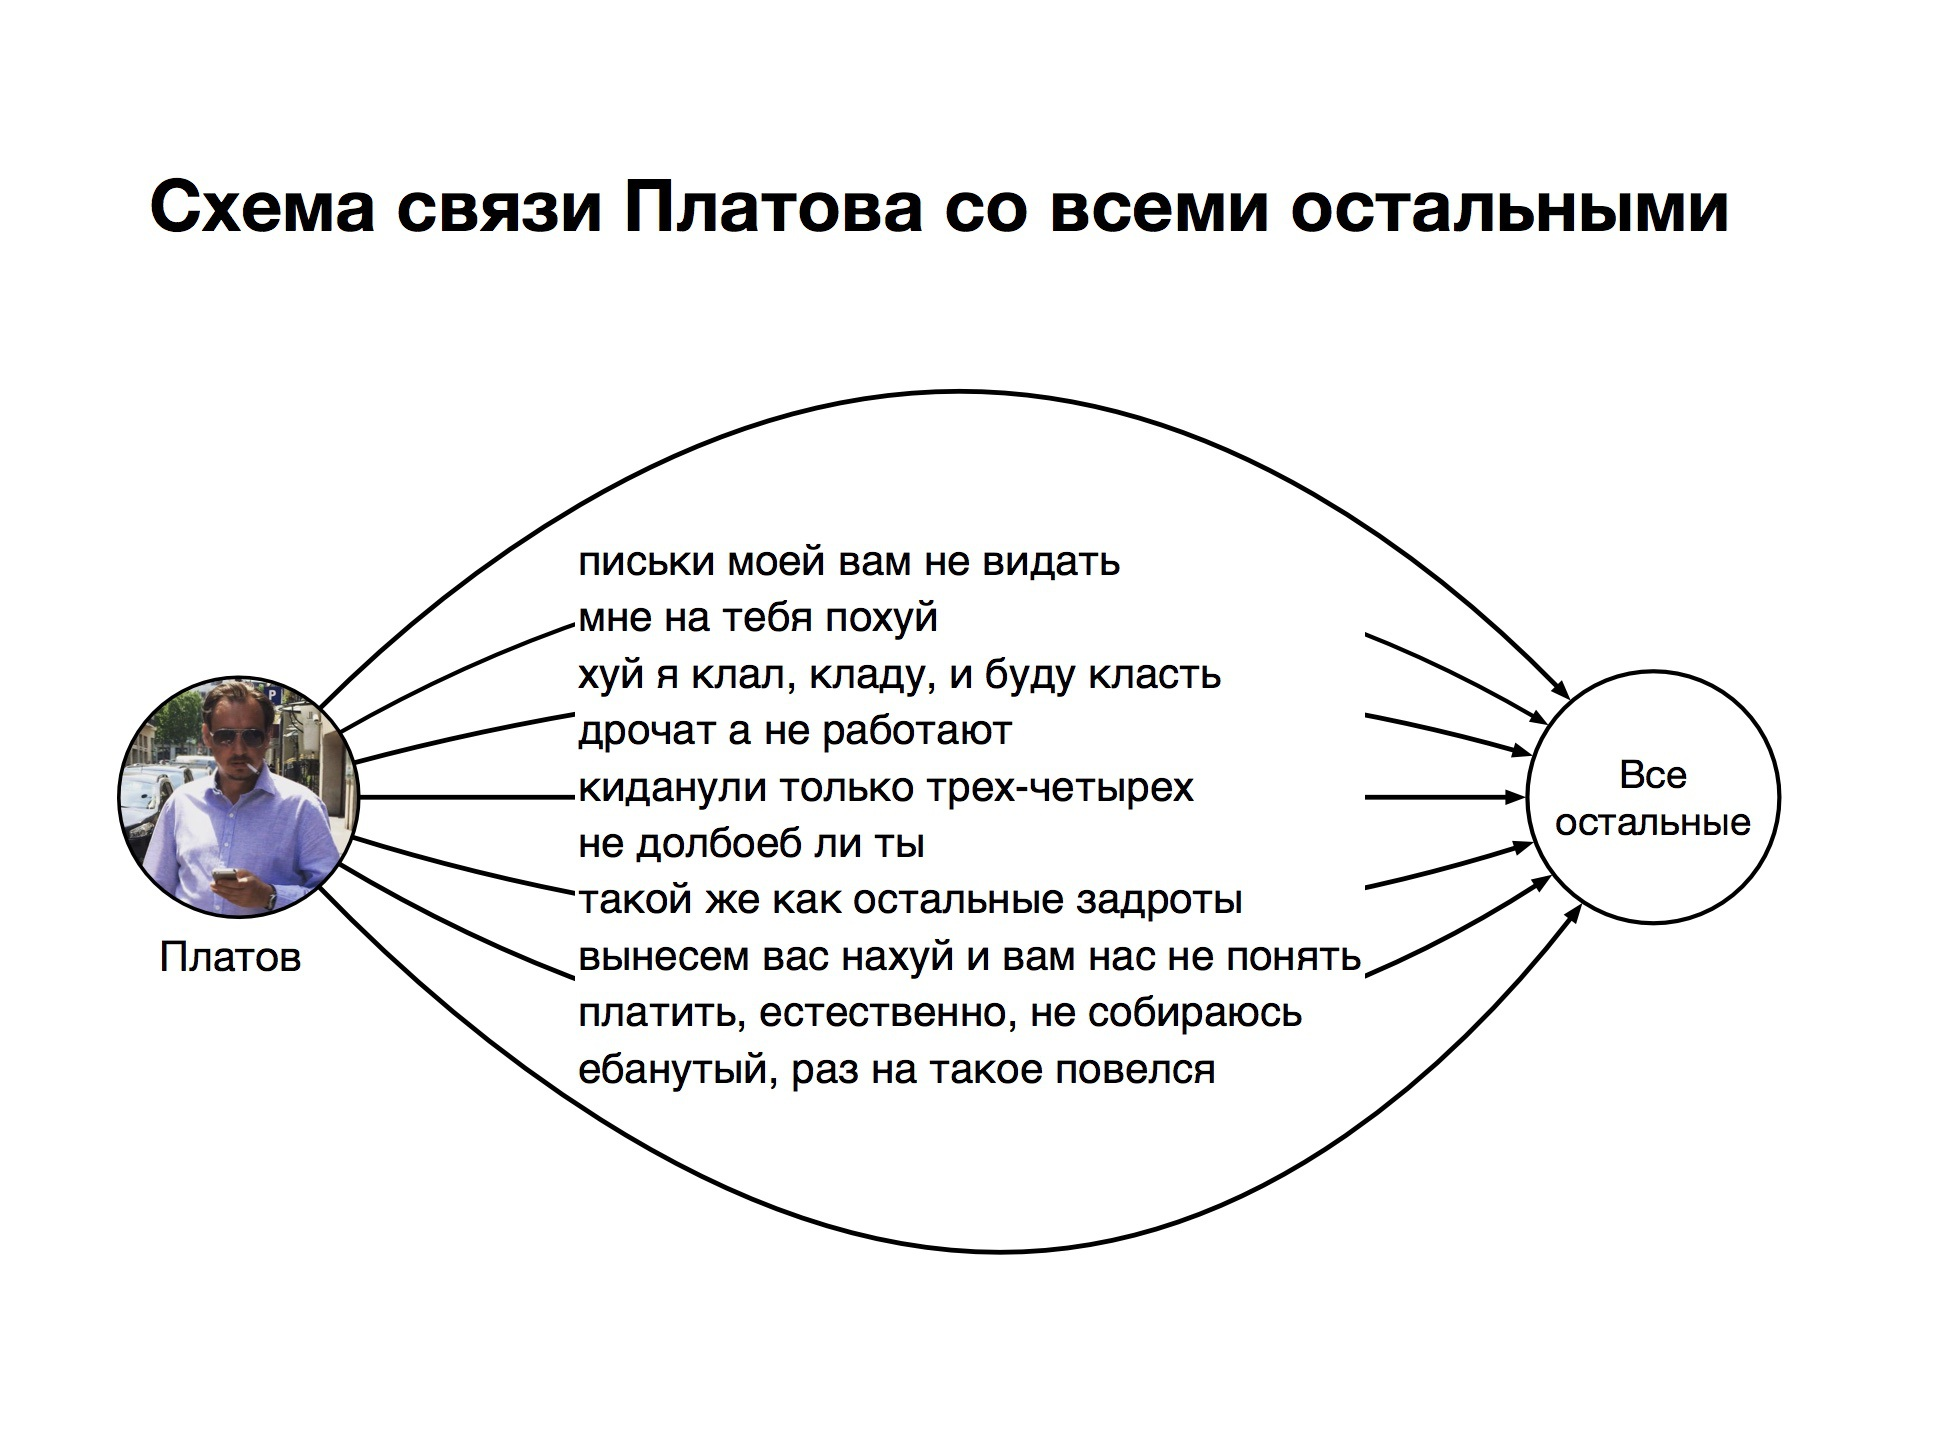 Кто-нибудь понял хоть что-то из хайпа про Платова?